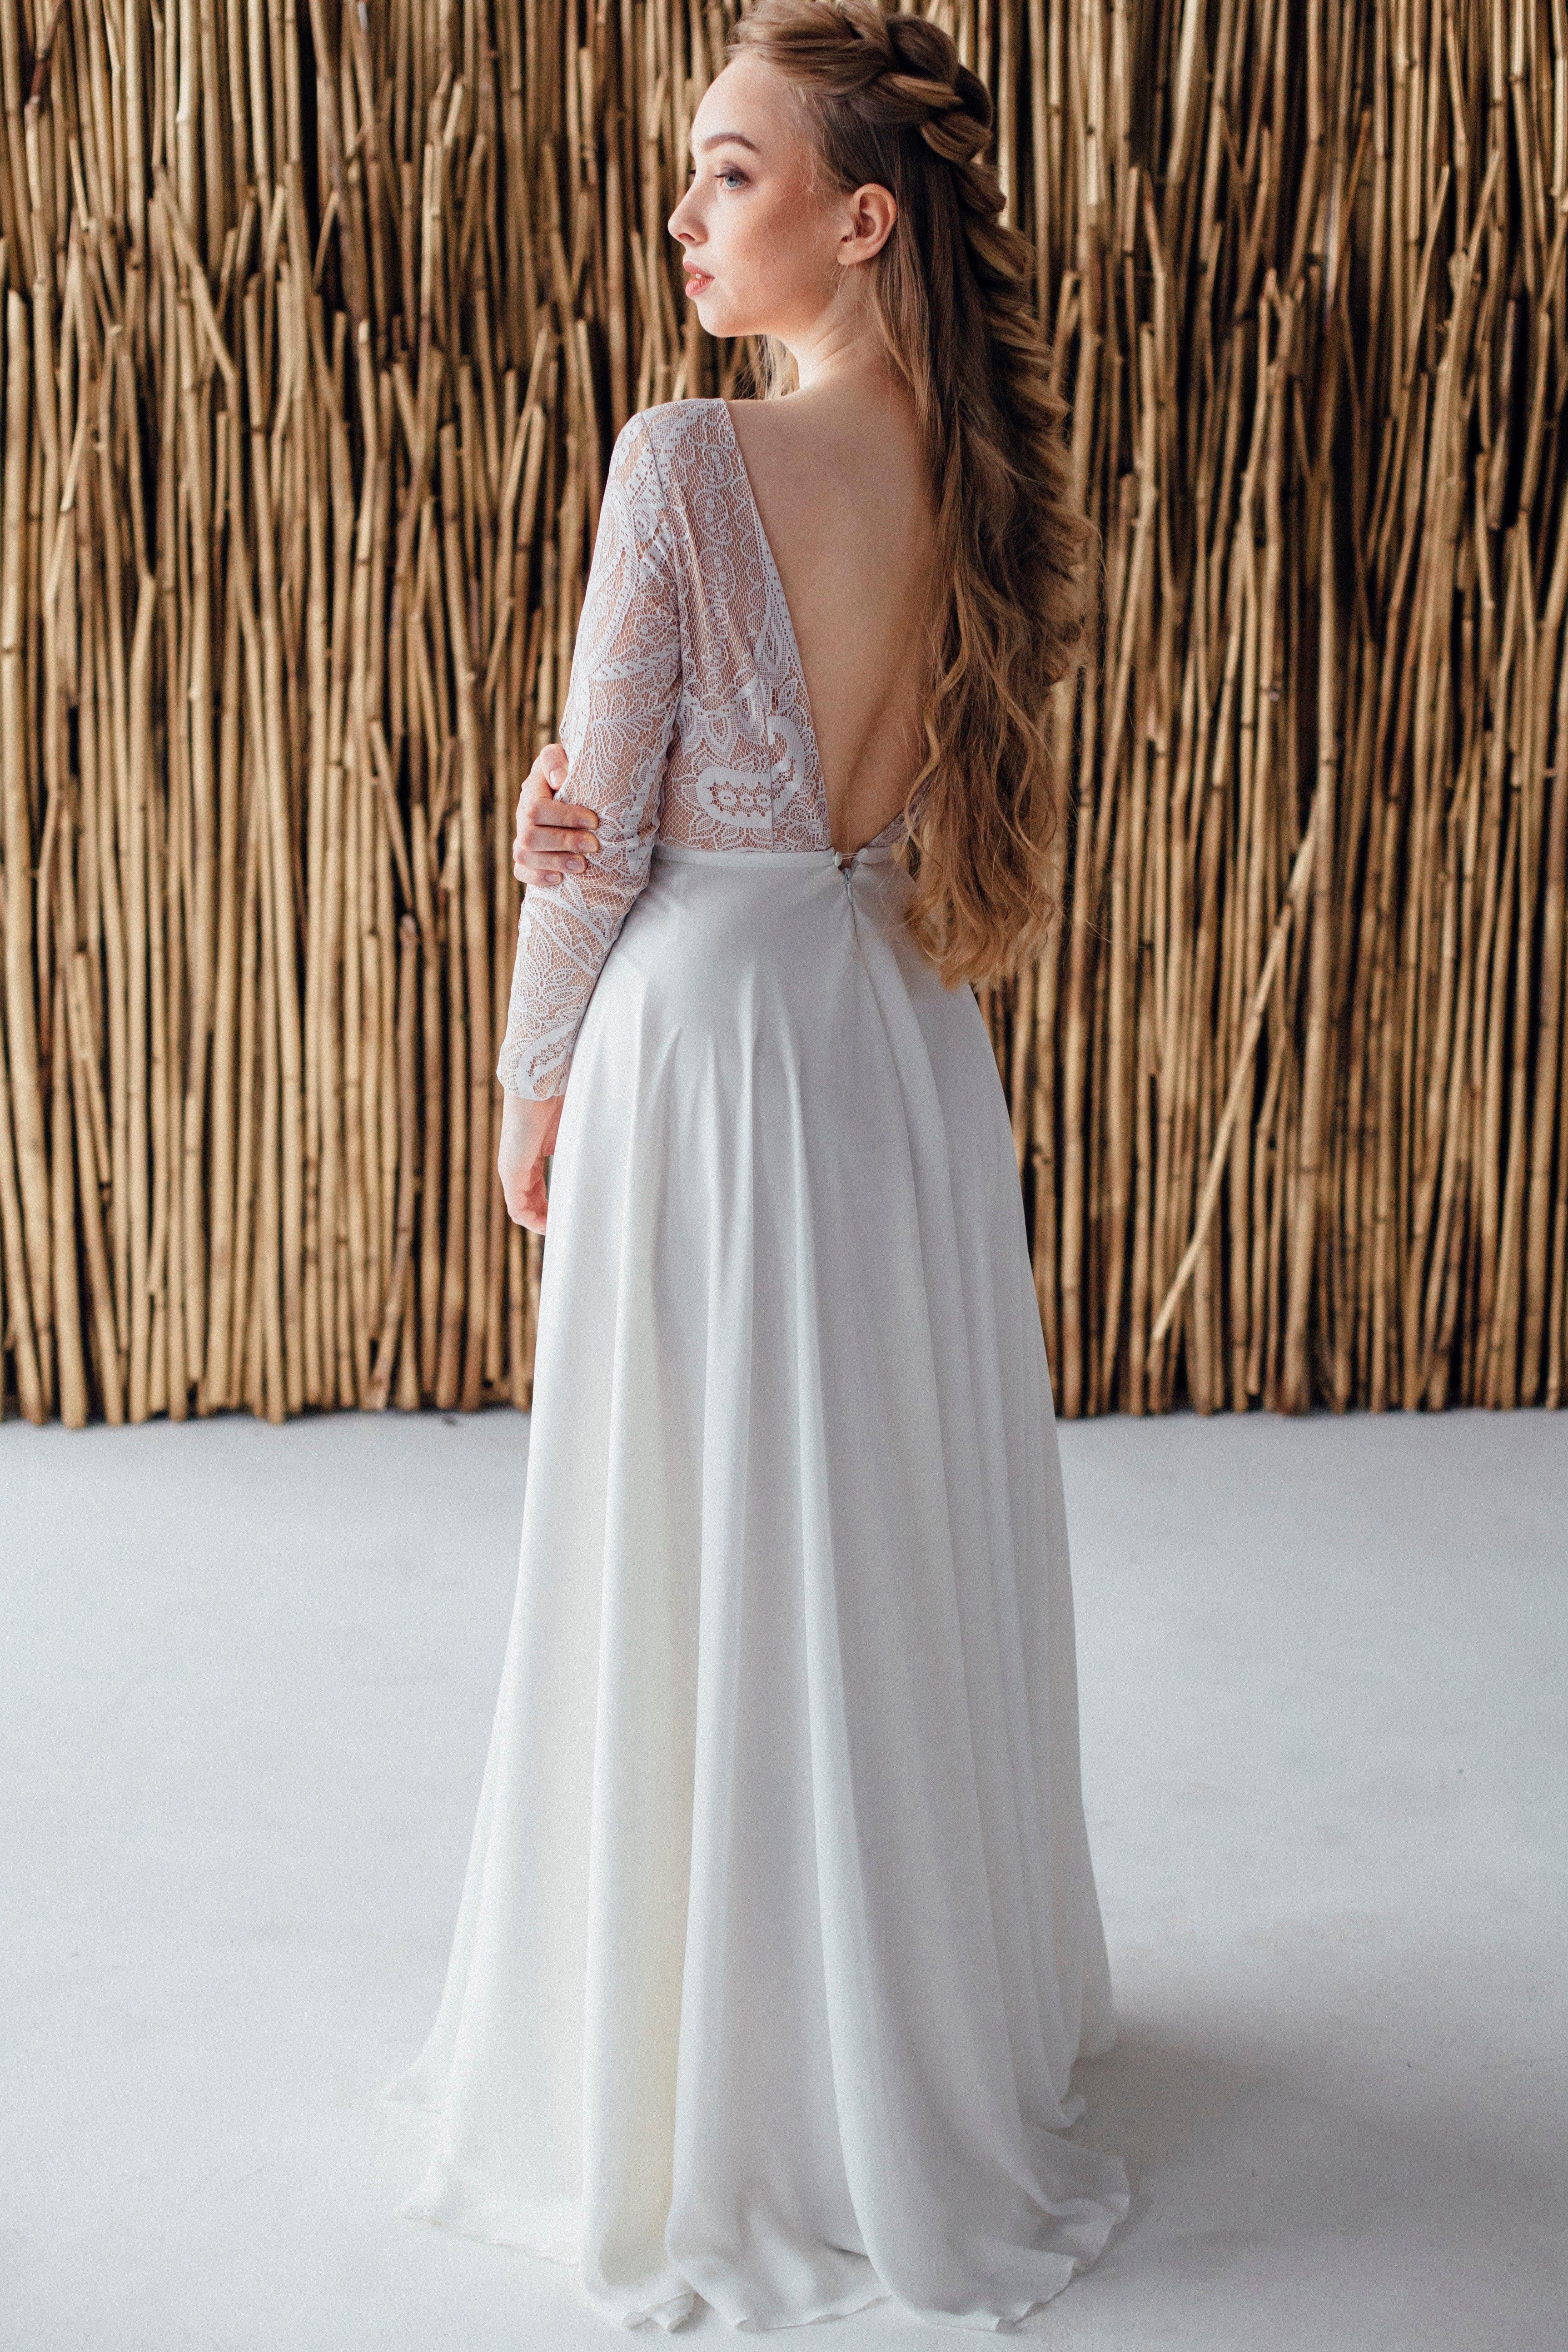 Свадебное платье GILL, коллекция MAGIC OF TENDERNESS, бренд LORA SONG, фото 4